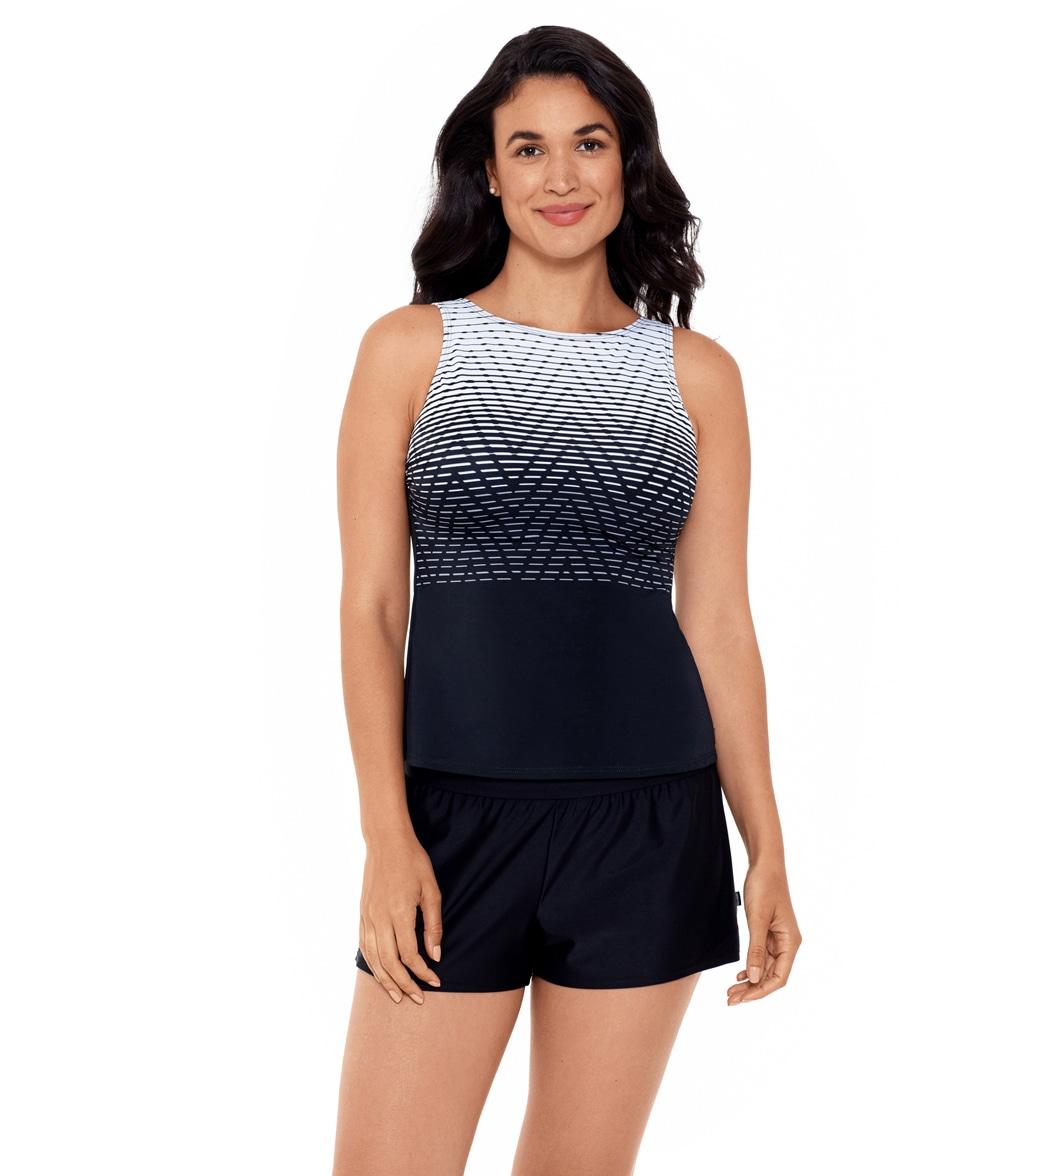 09075b00fe Reebok Women's Endless Endurance High Neck Chlorine Resistant Tankini at  SwimOutlet.com - Free Shipping